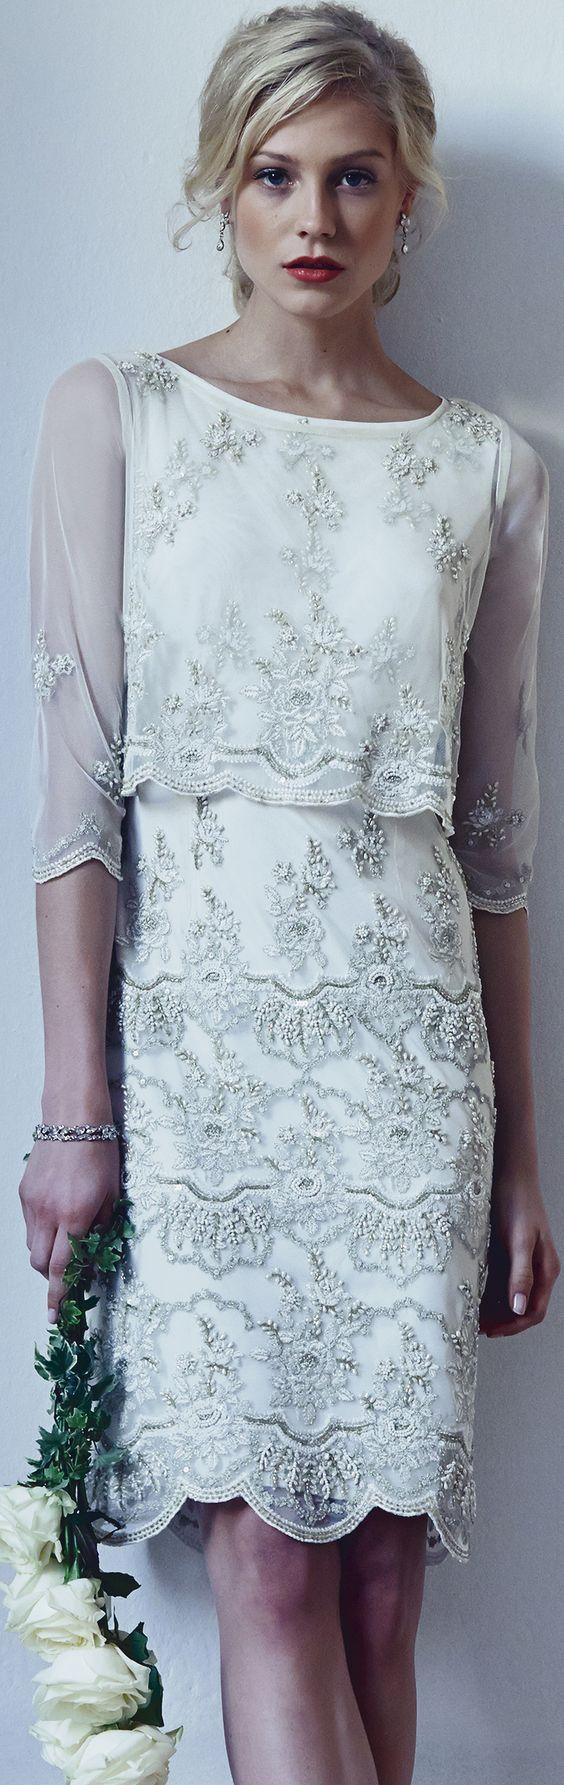 wedding fashion tips for brides